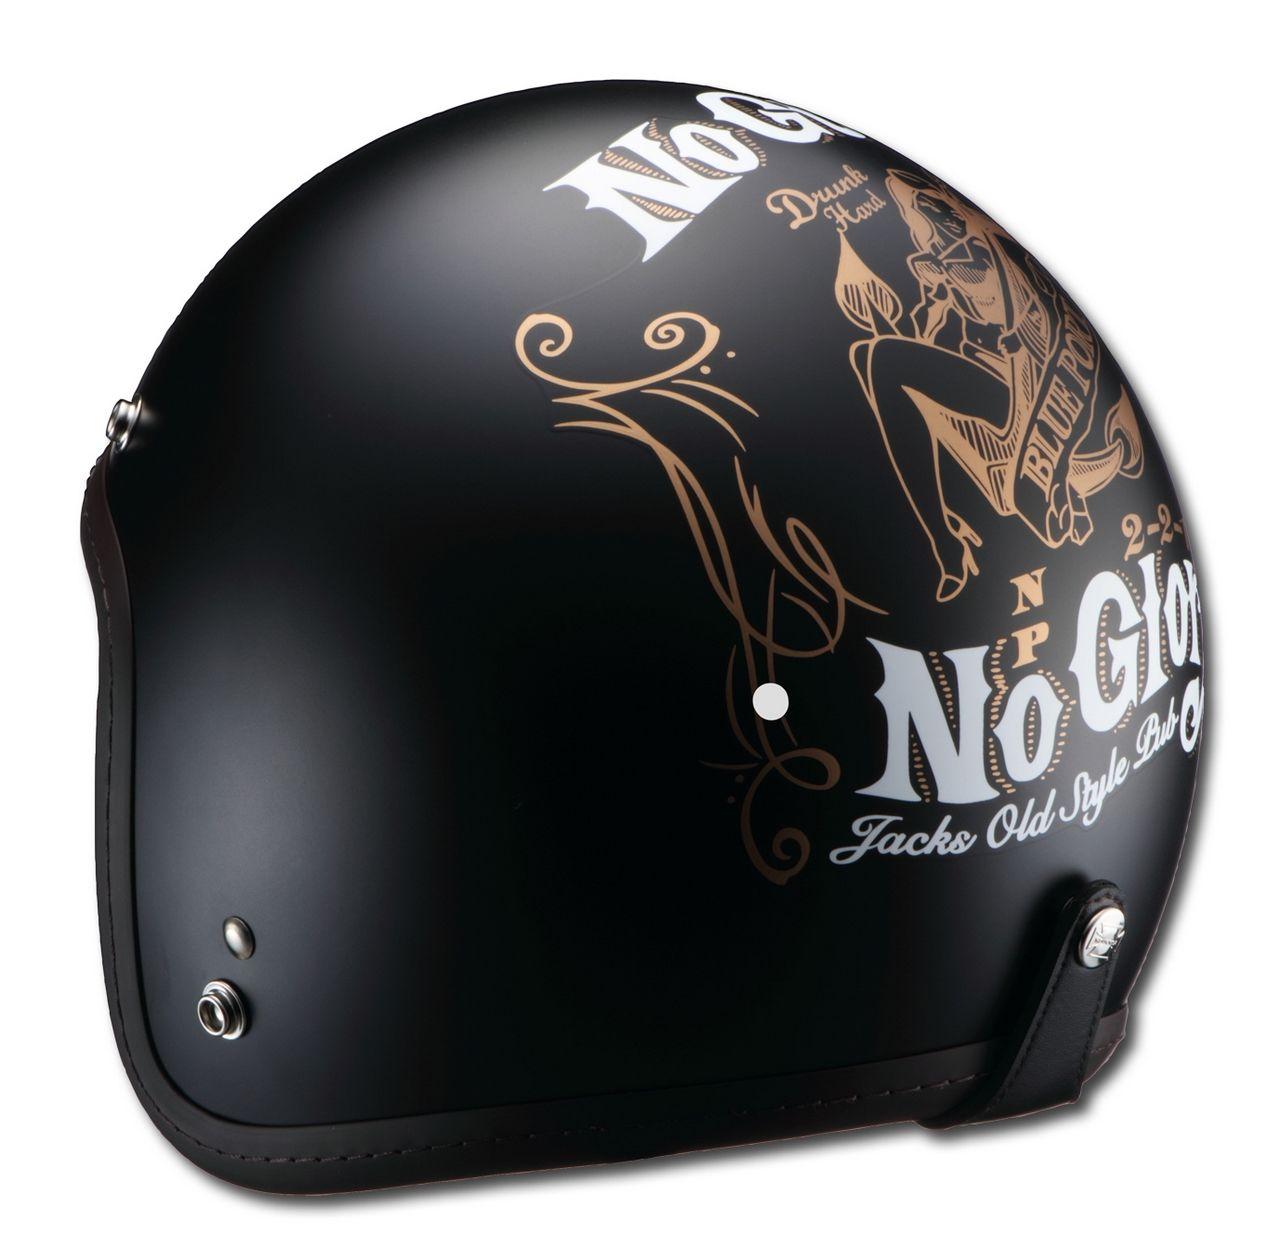 【RIDEZ】Knuckle Head RJ605 NoGutsNoGlory JET安全帽 - 「Webike-摩托百貨」